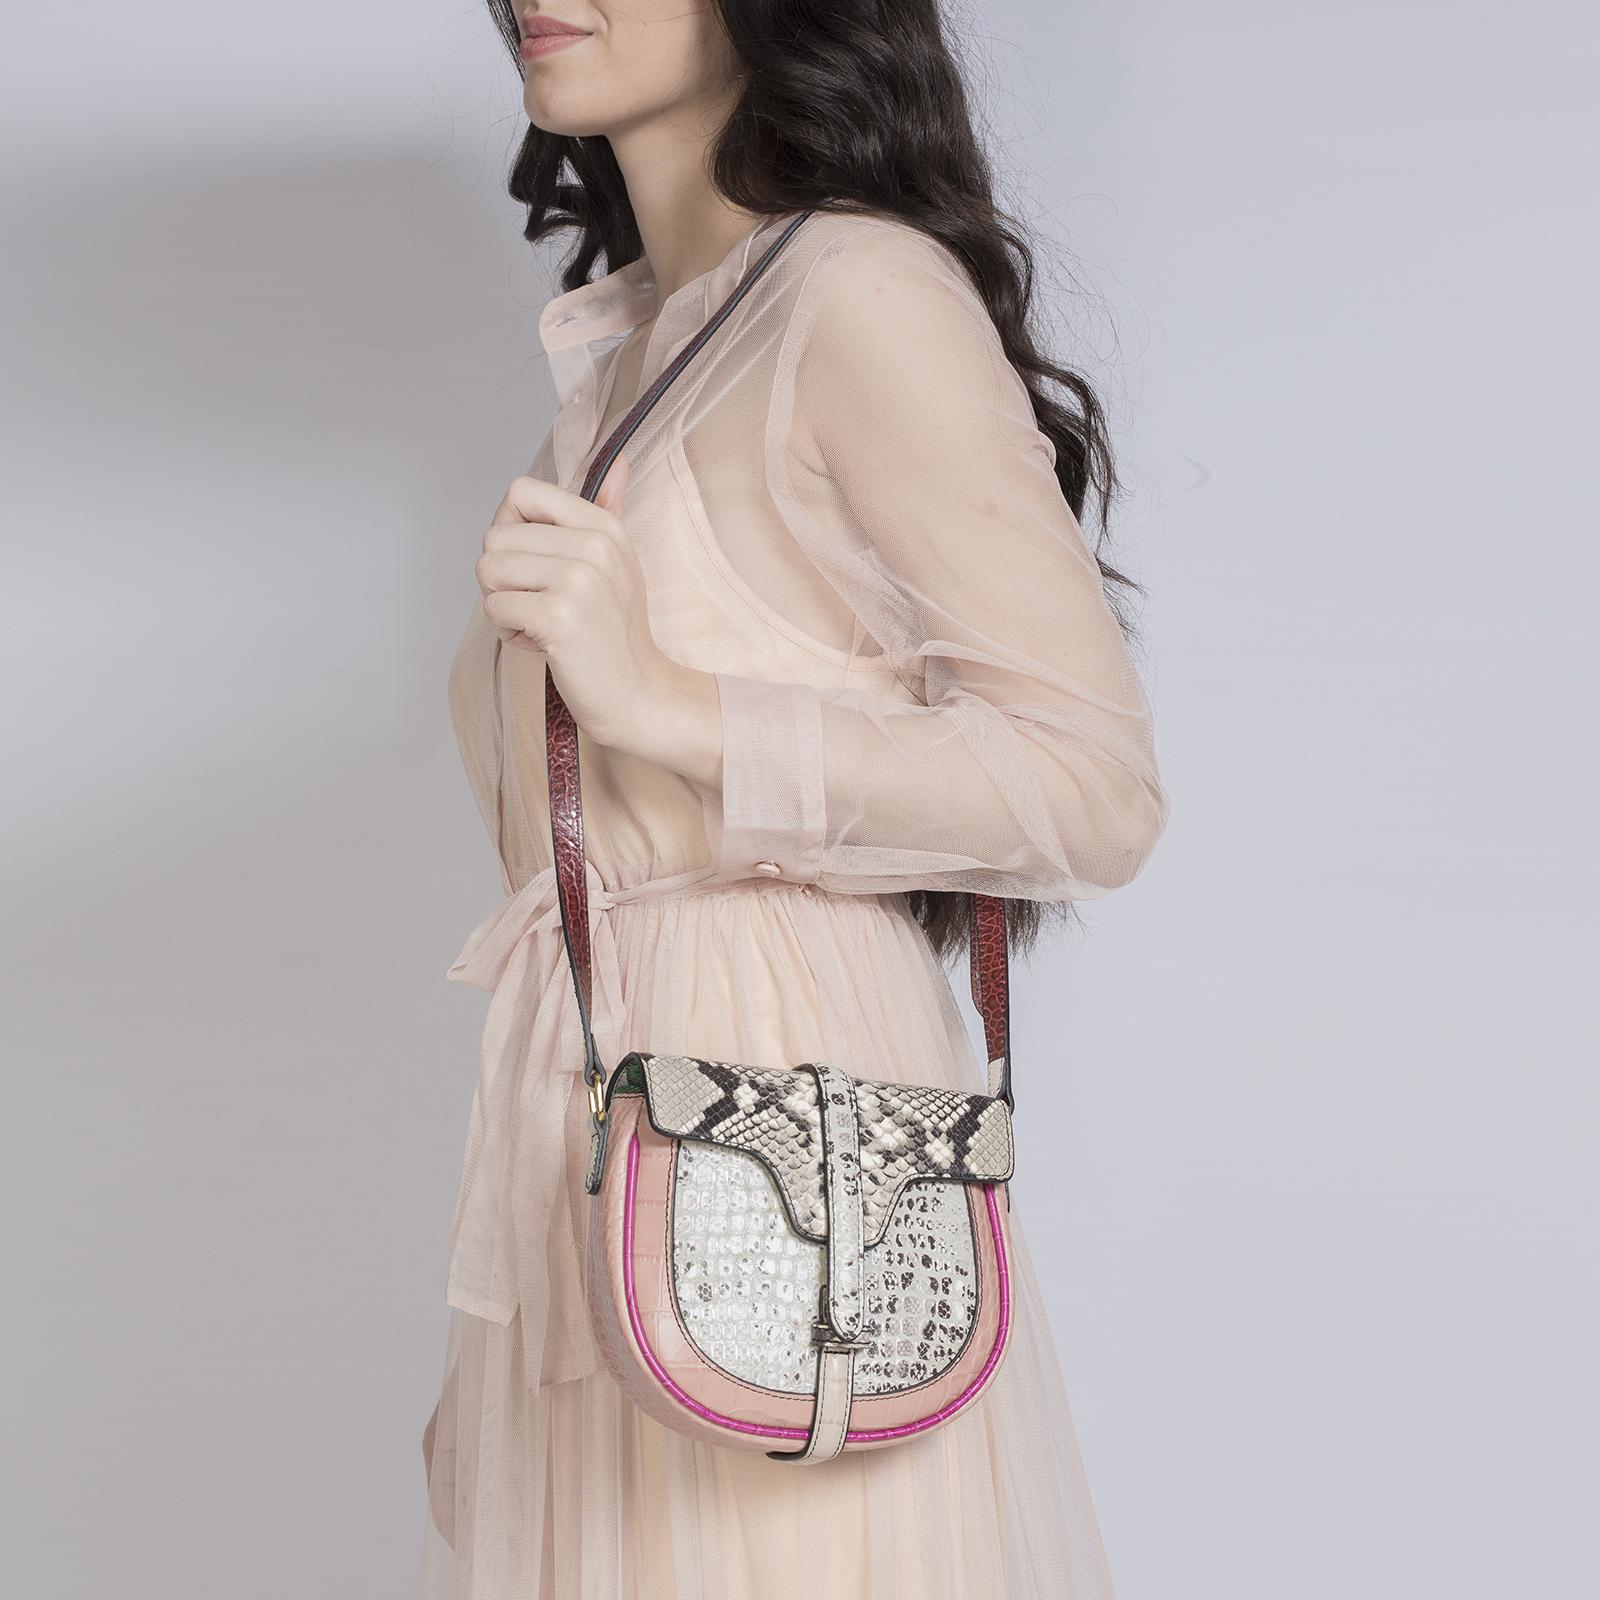 Saddle bag, UNO, It Bag (розовый)